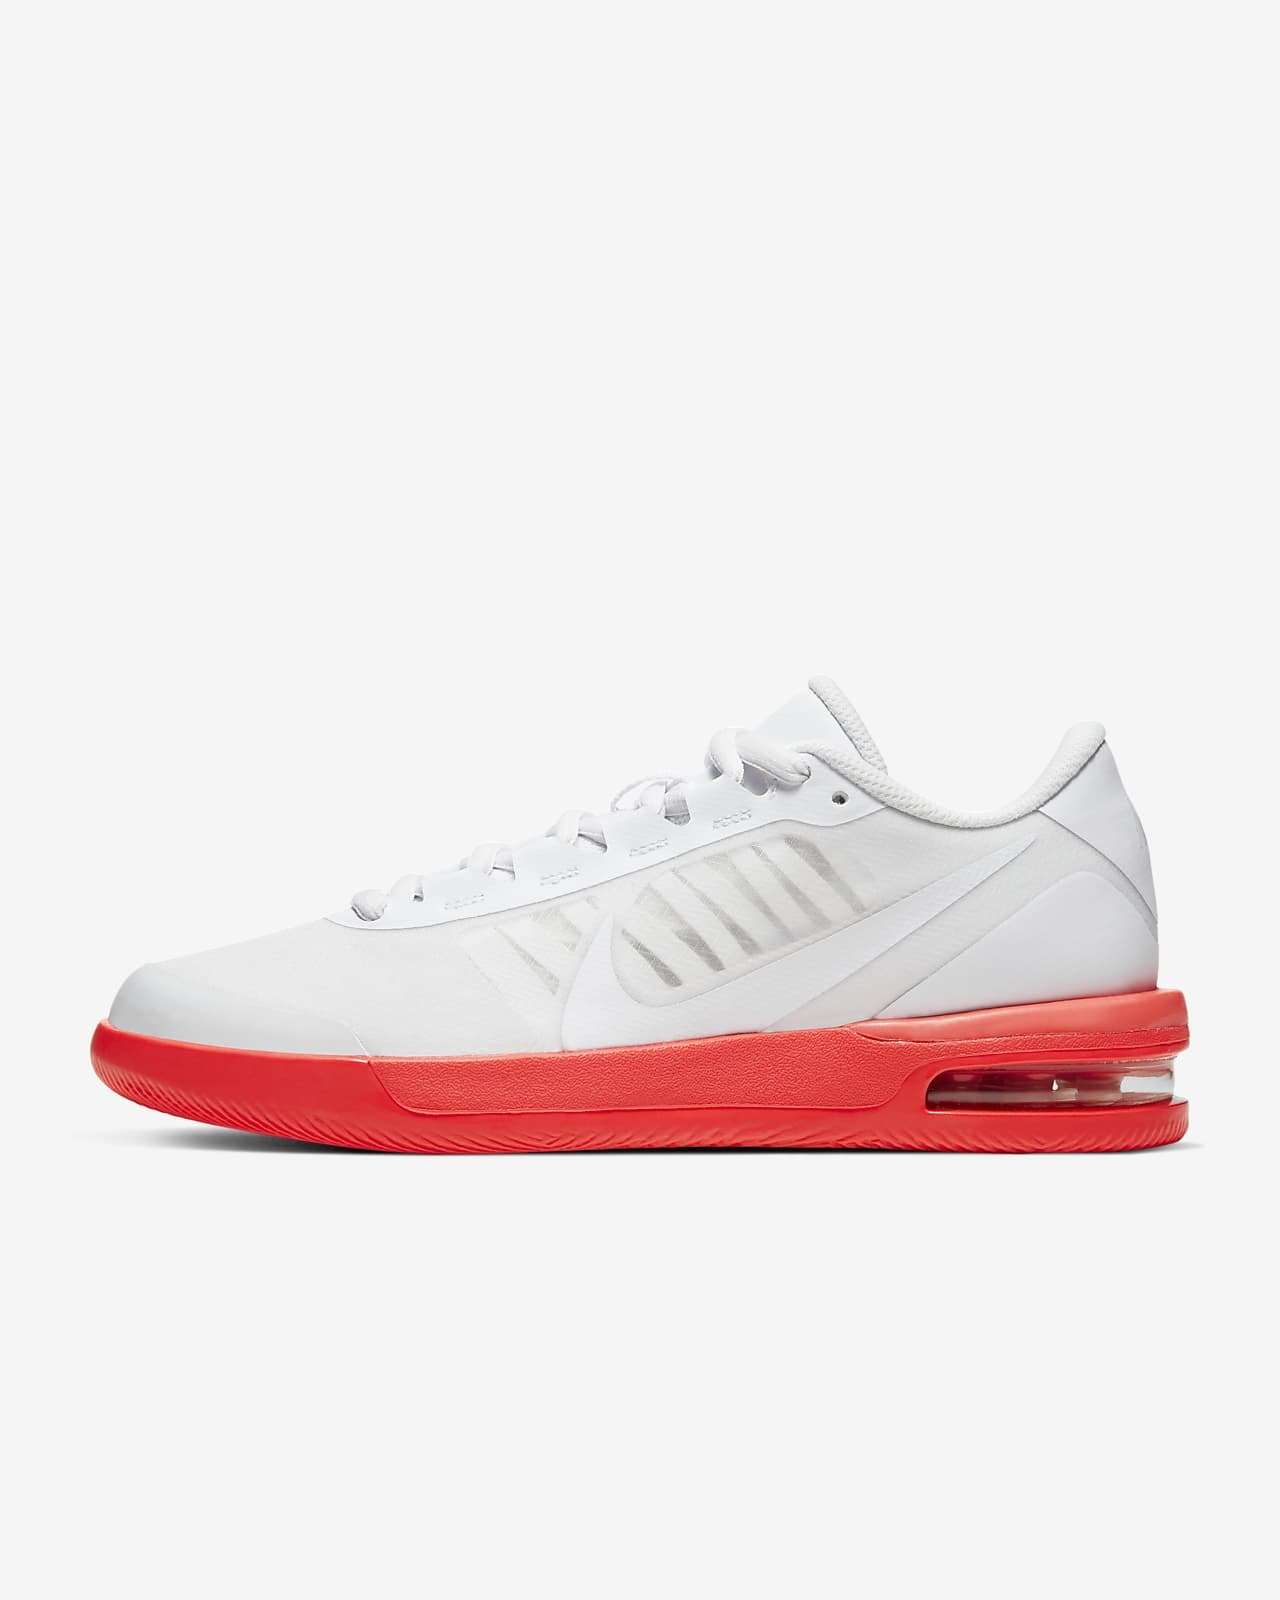 NikeCourt Air Max Vapor Wing MS tennissko til dame